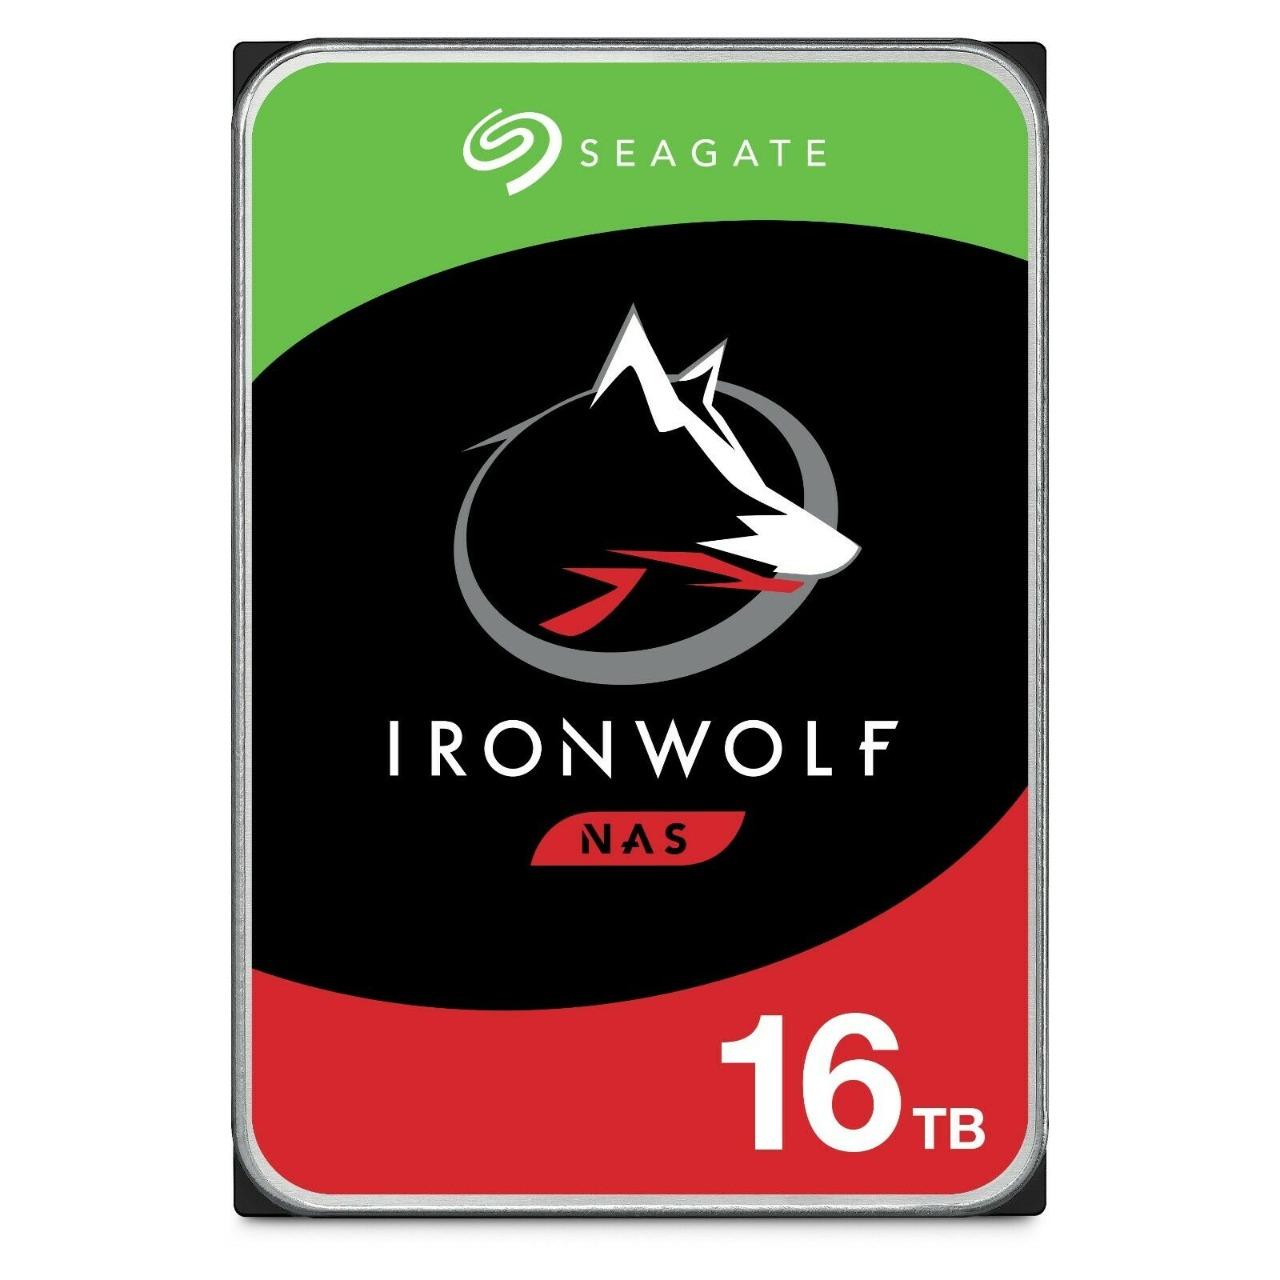 HD Seagate IronWolf NAS 16TB SATA 7200RPM